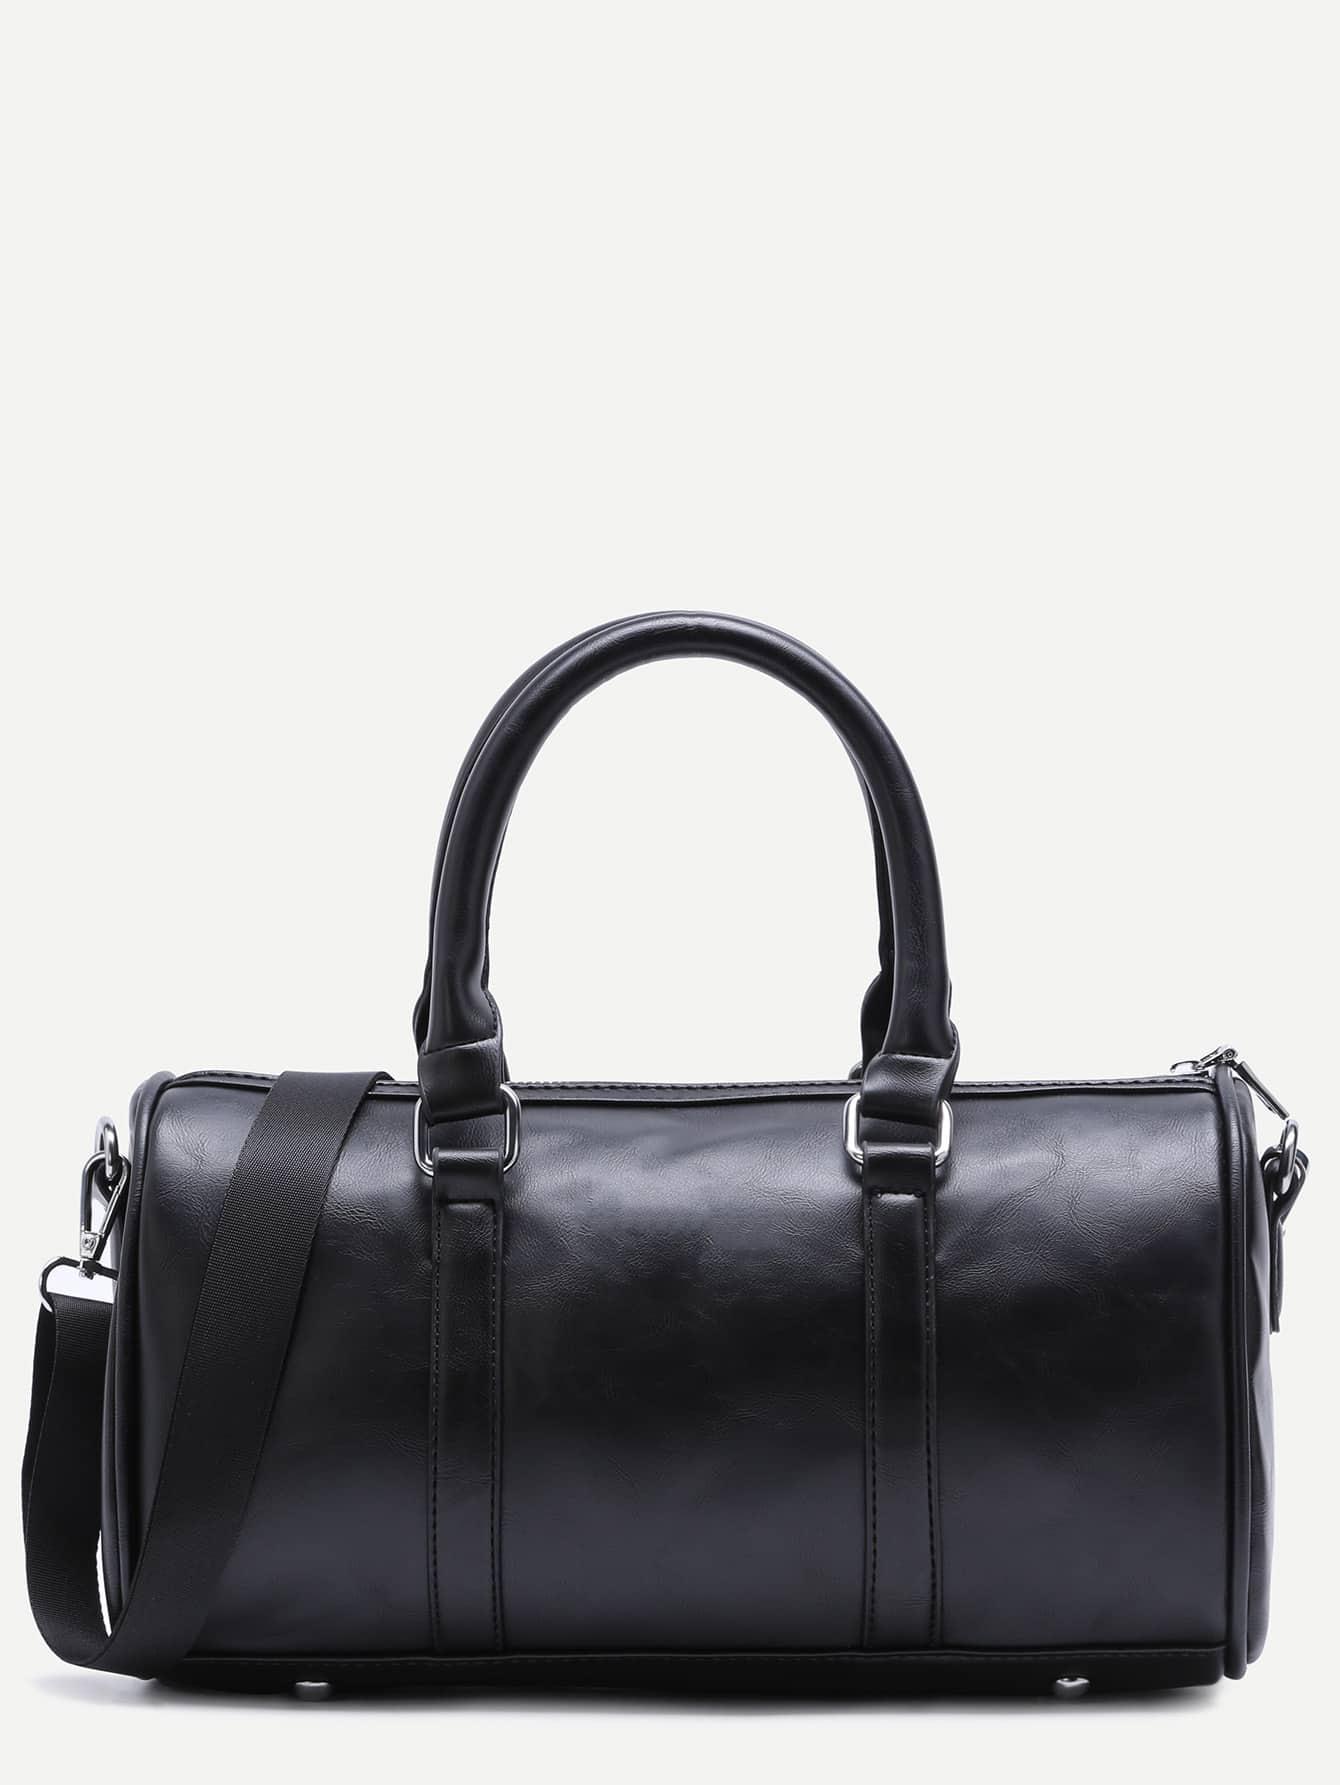 bag161025308_2